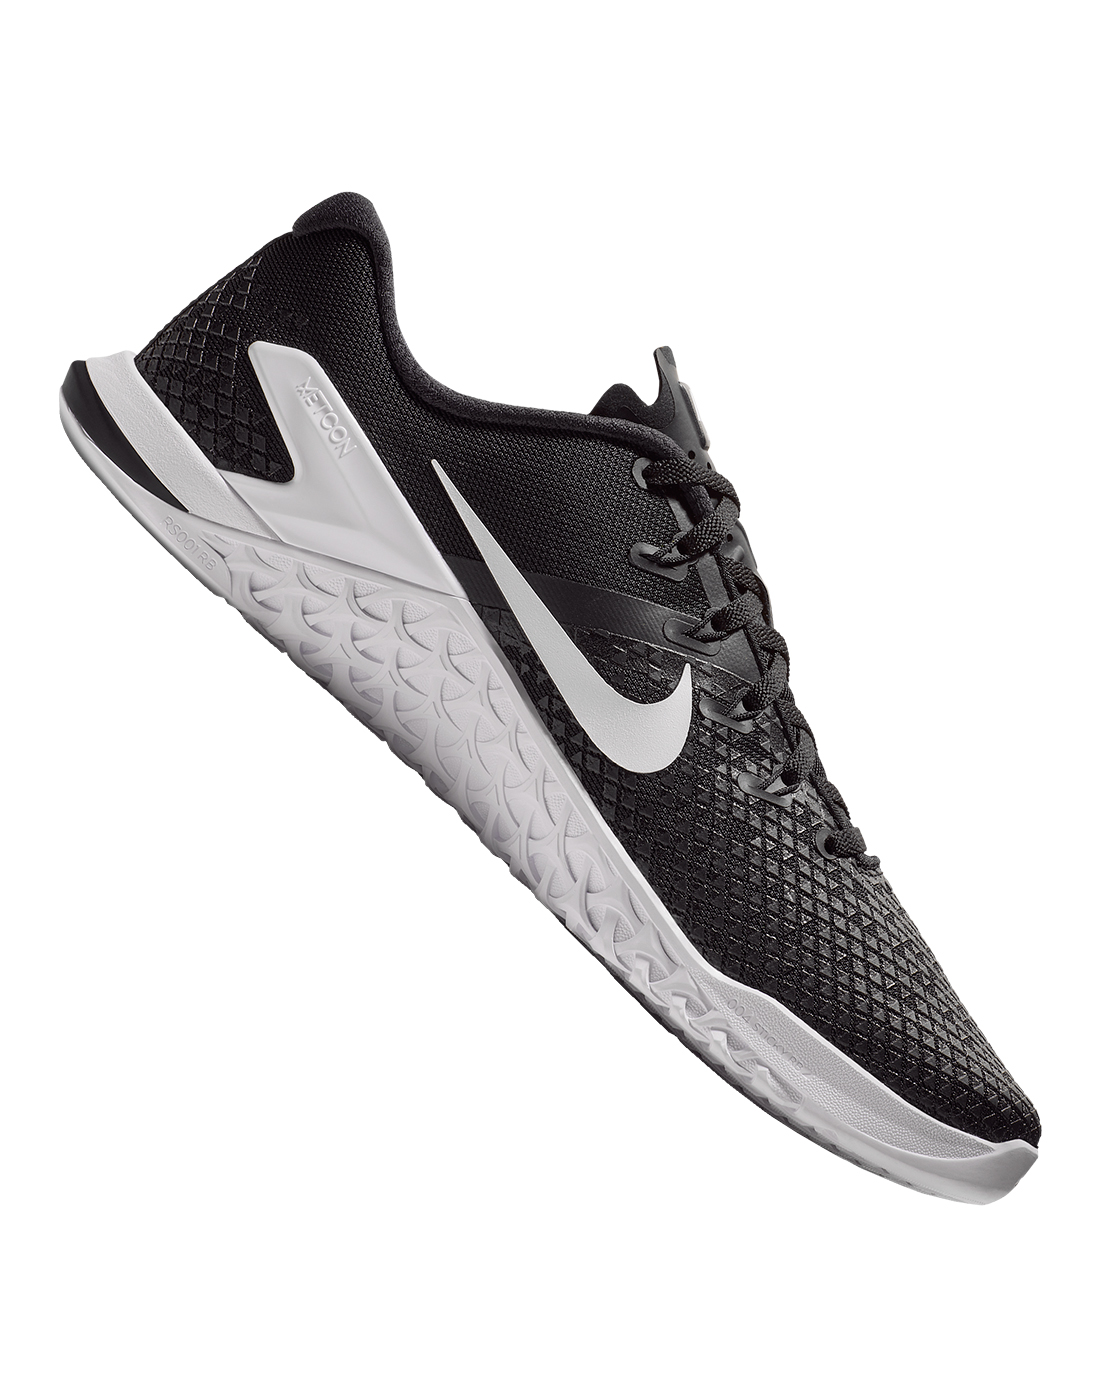 96e6c54d05fe5 Men's Black Nike Metcon 4 XD | Life Style Sports